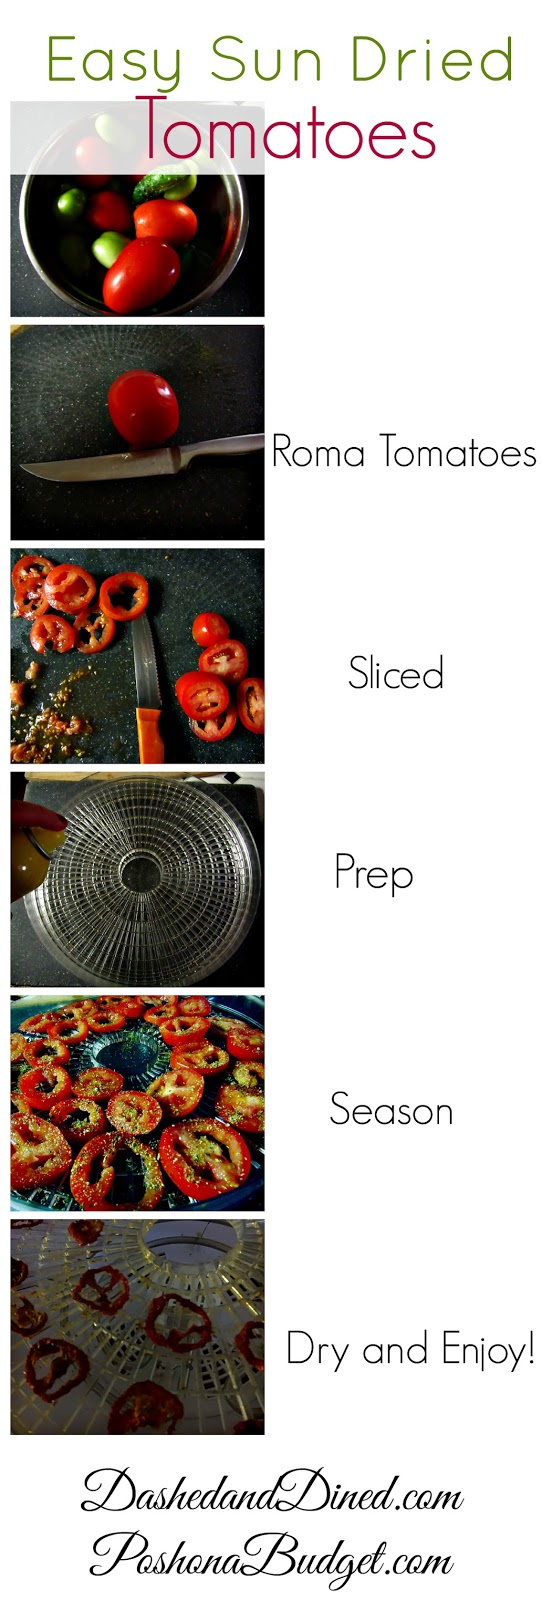 Easy Sun Dried Tomatoes